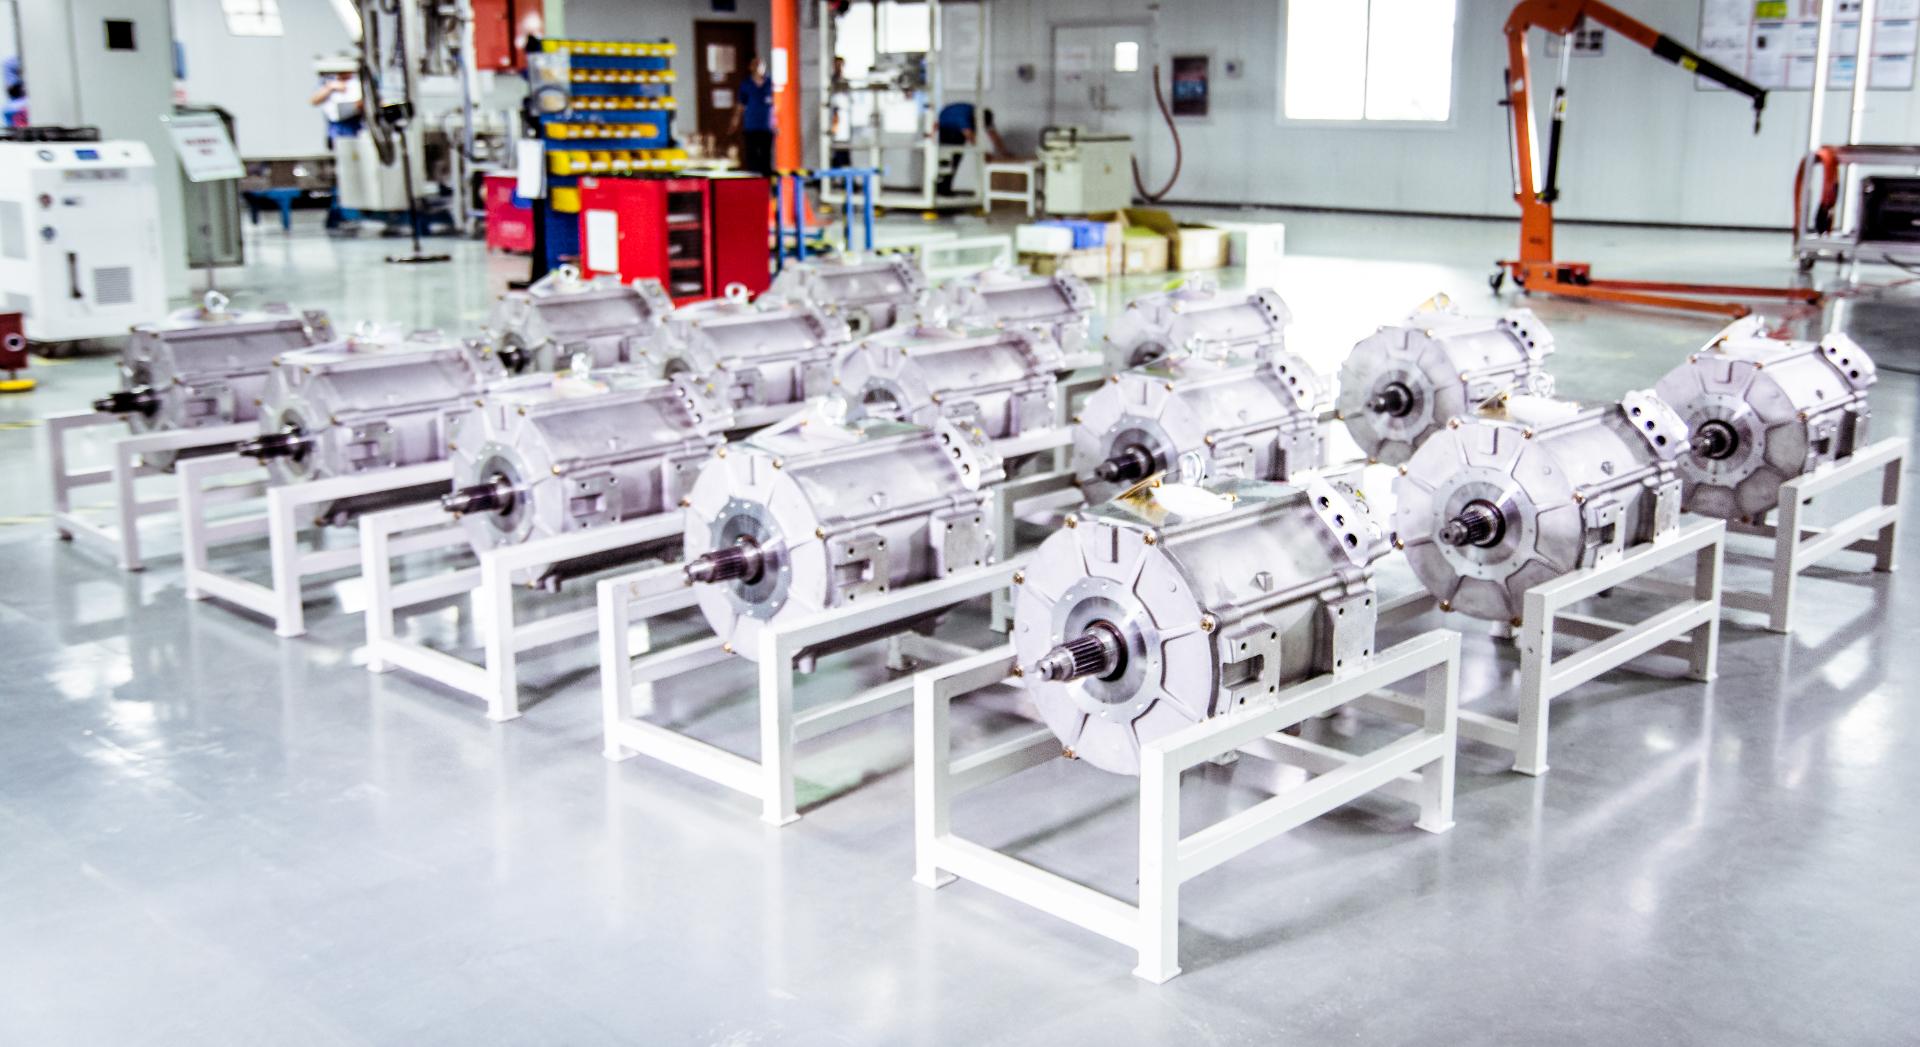 Dana TM4 - Electric and hybrid powertrain systems